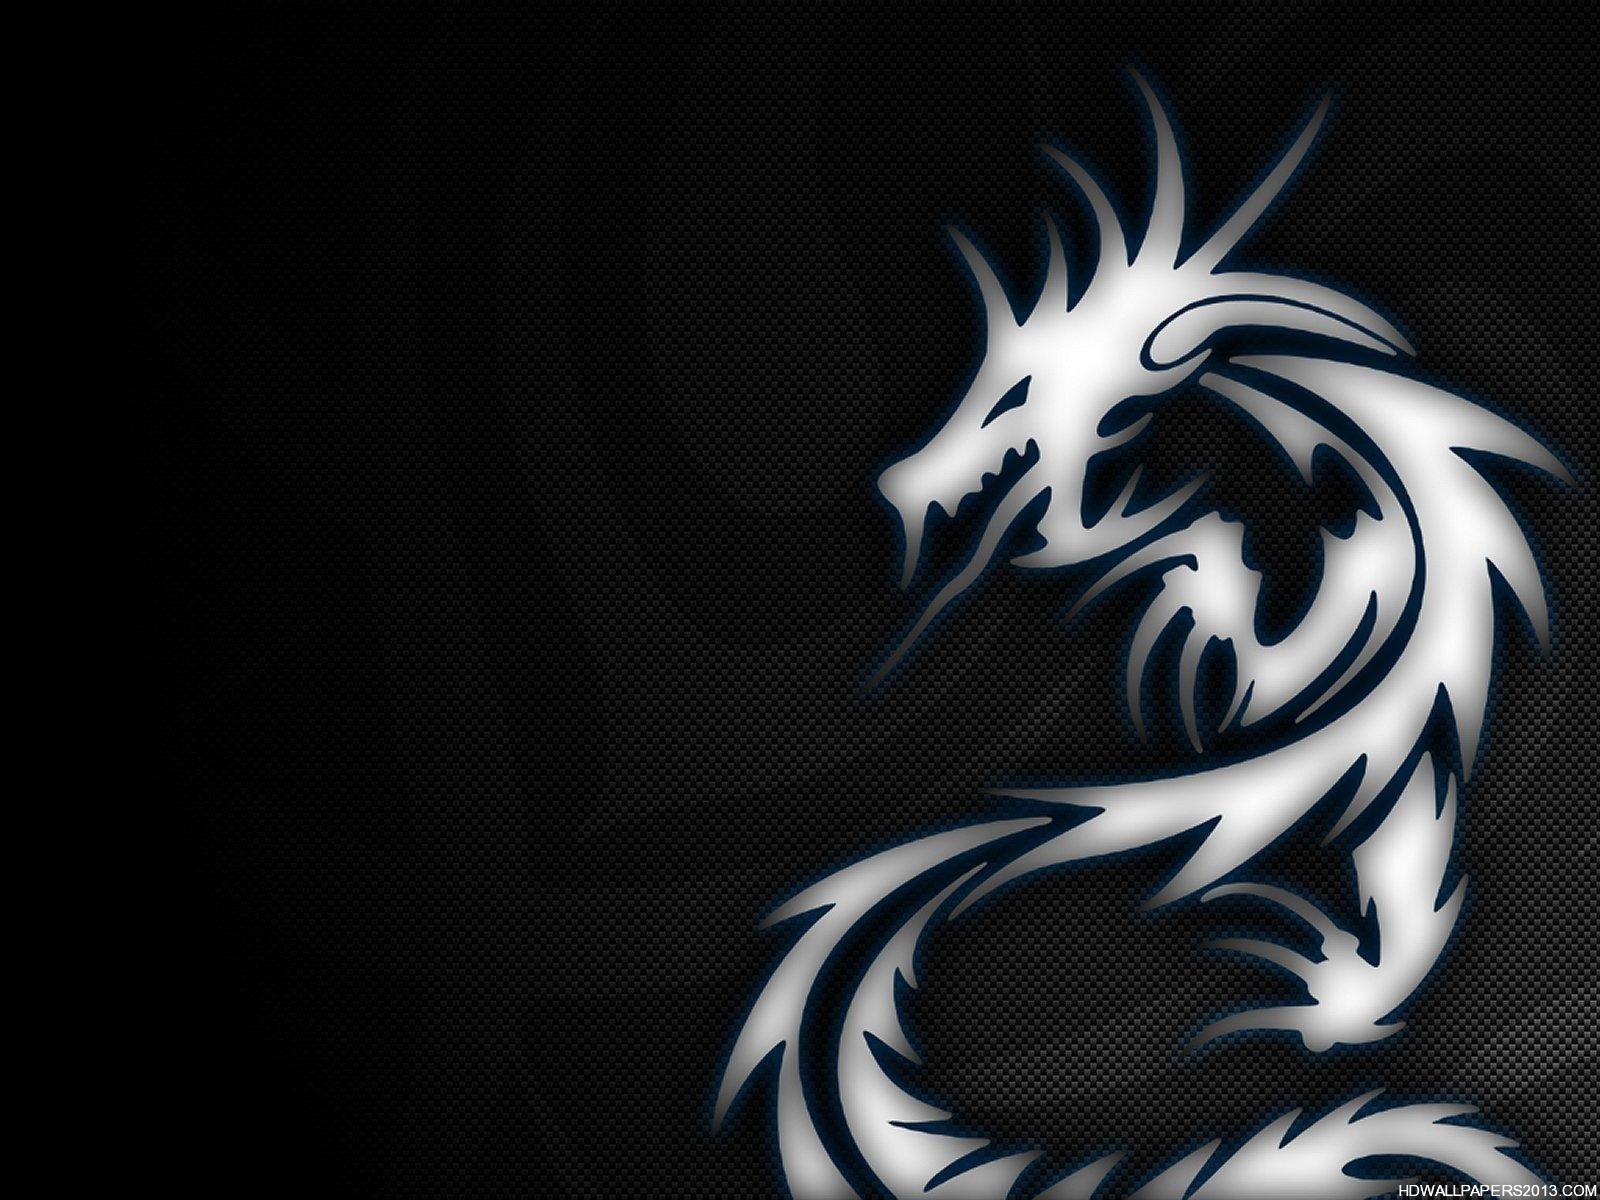 Dragon Desktop Wallpapers HD Wallpapers Dragon Desktop Wallpapers 1600x1200